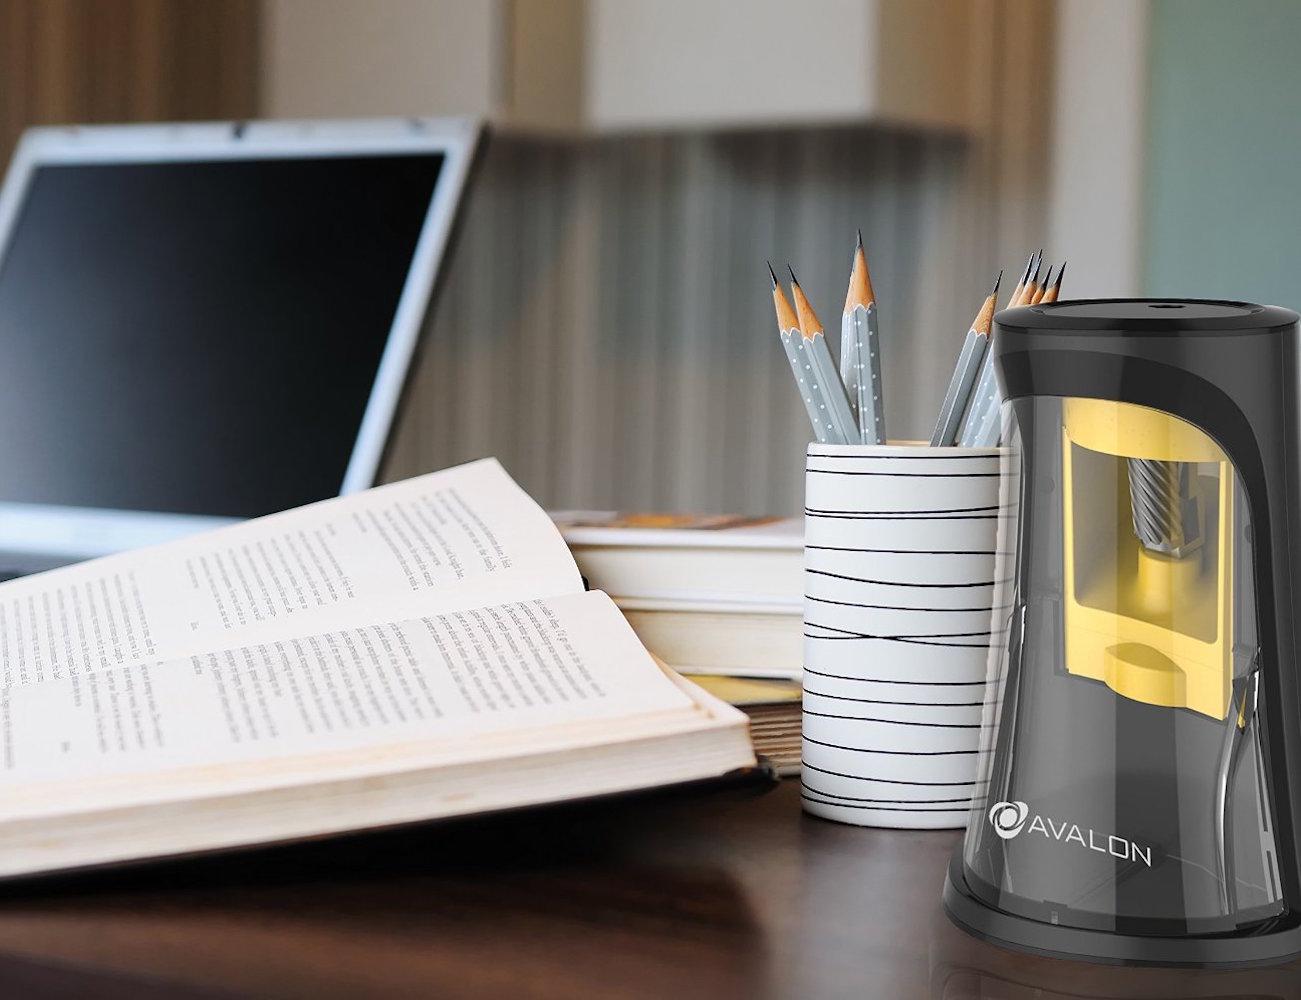 Avalon Fully Electronic Pencil Sharpener